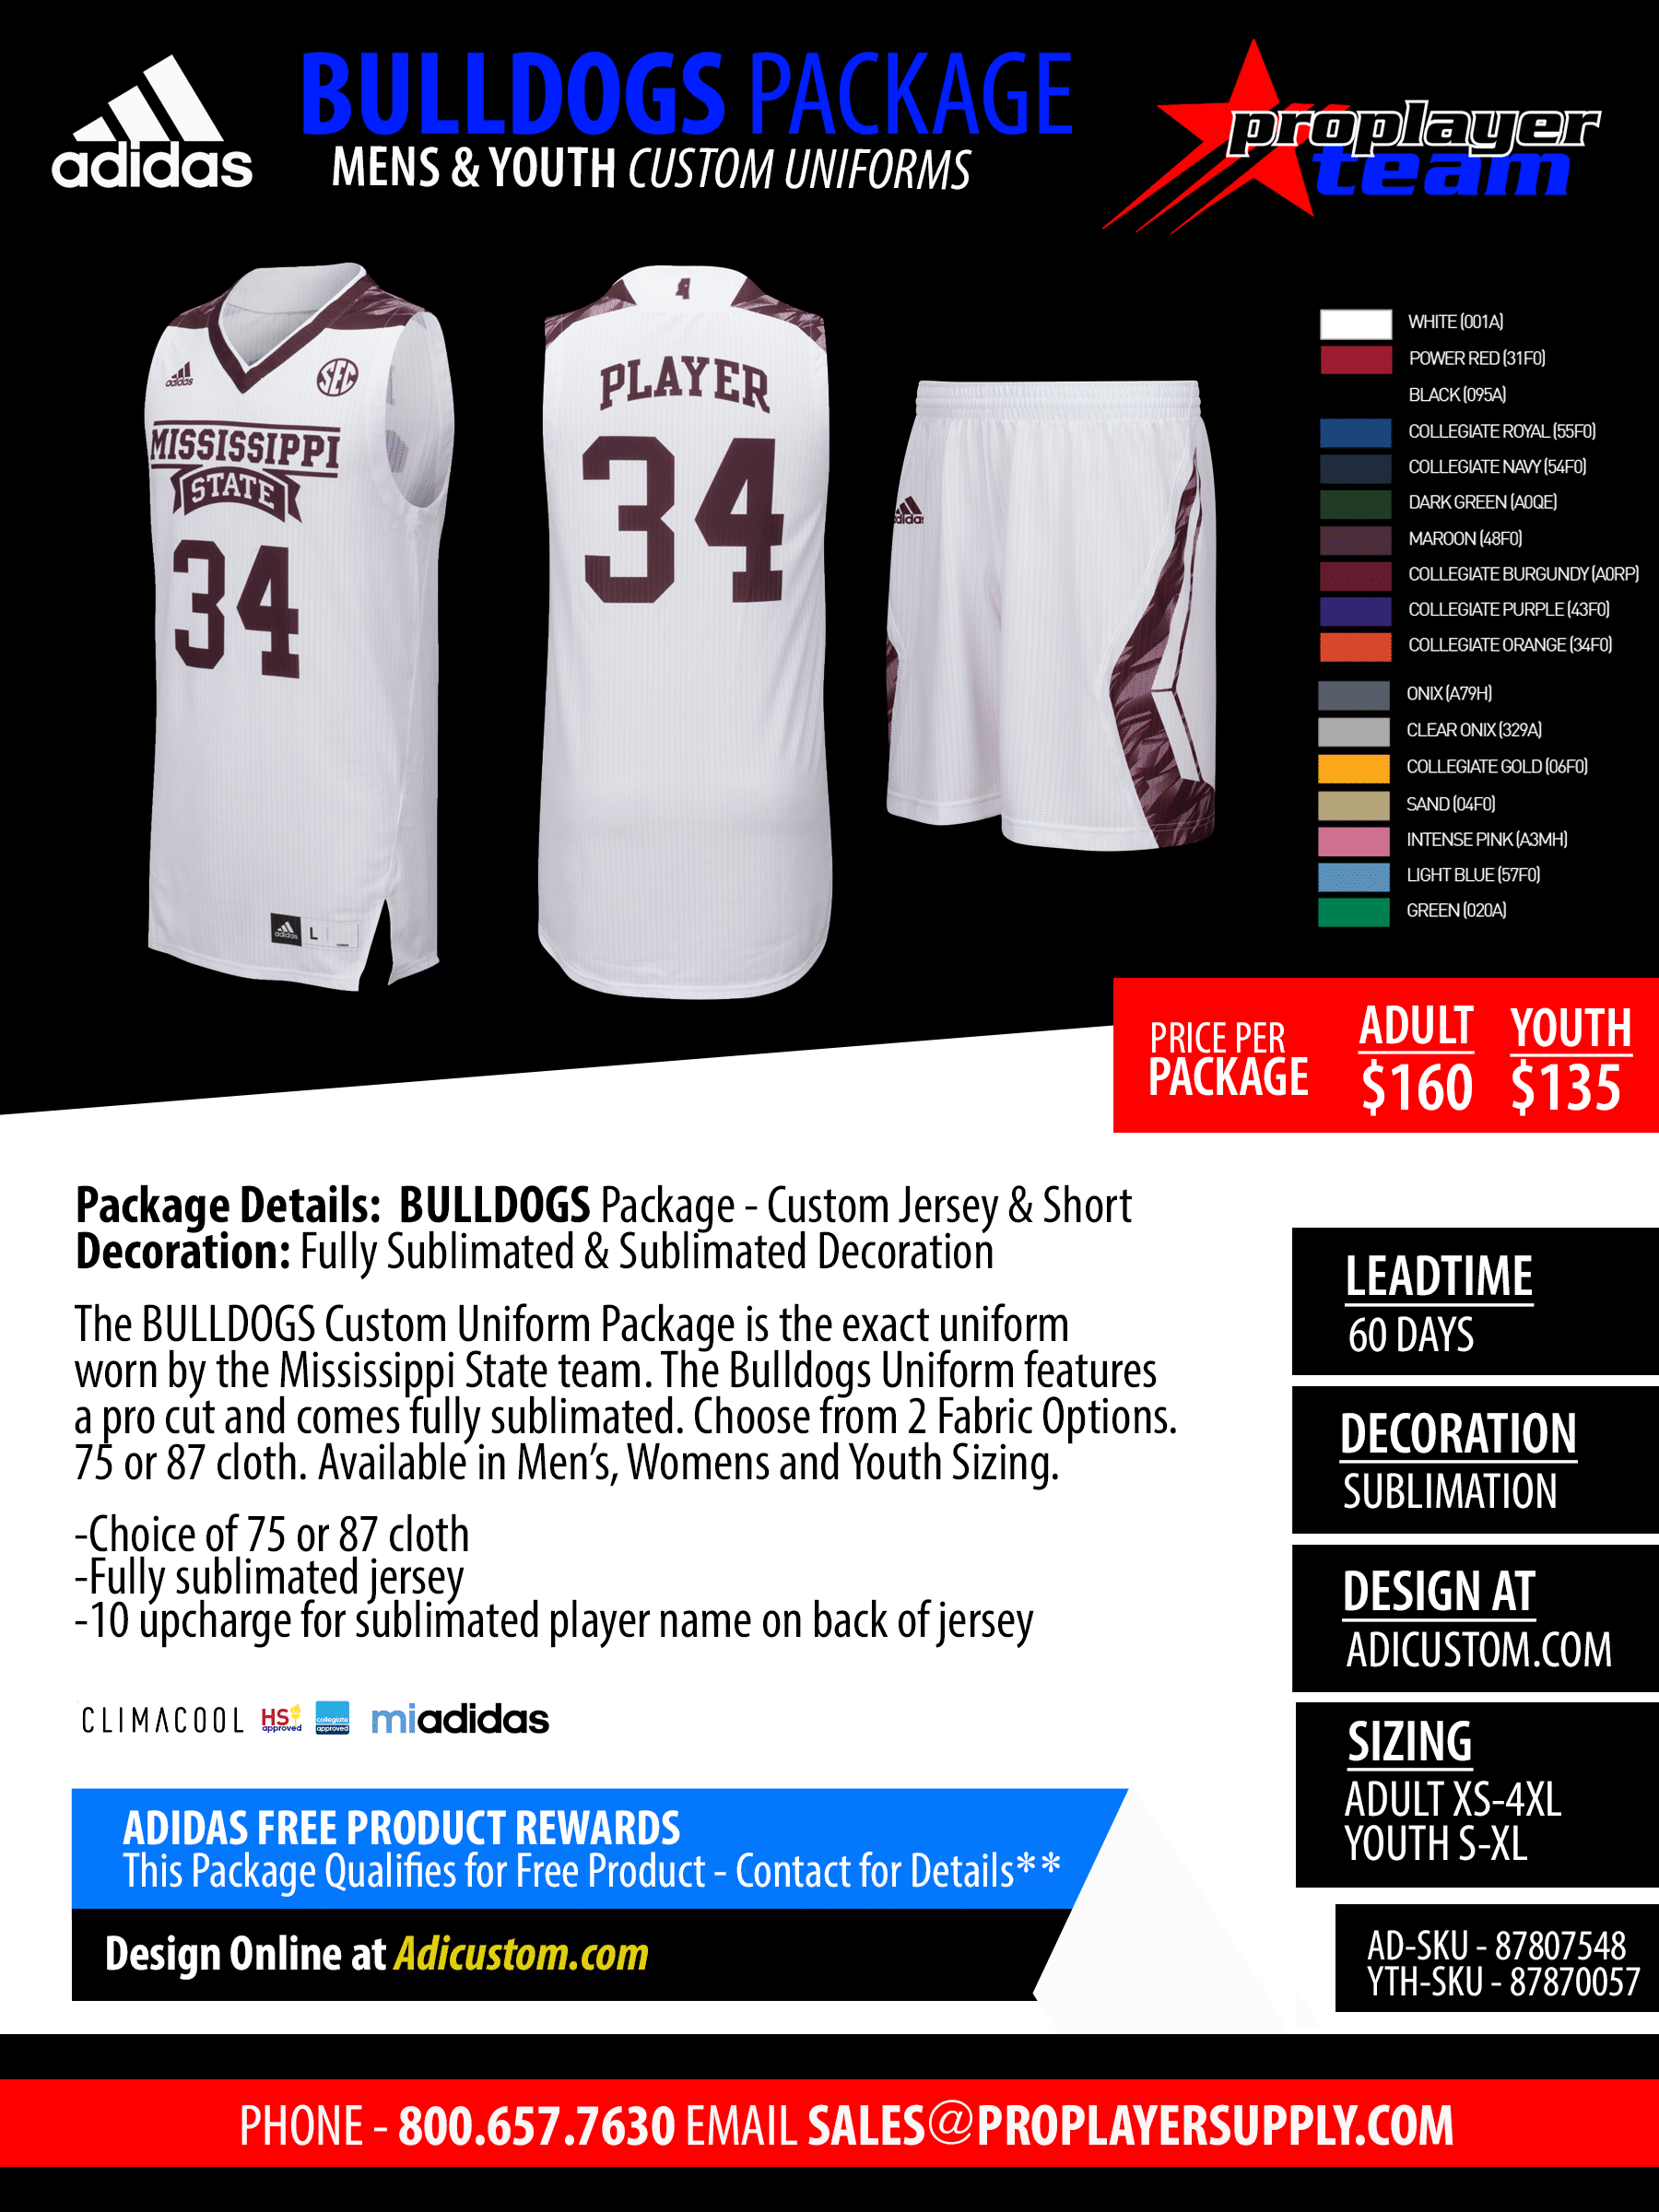 27b4e4da84c Adidas Custom Bulldogs Mens Pro Basketball Jersey Package. Custom (60 Days)  Click for PDF>